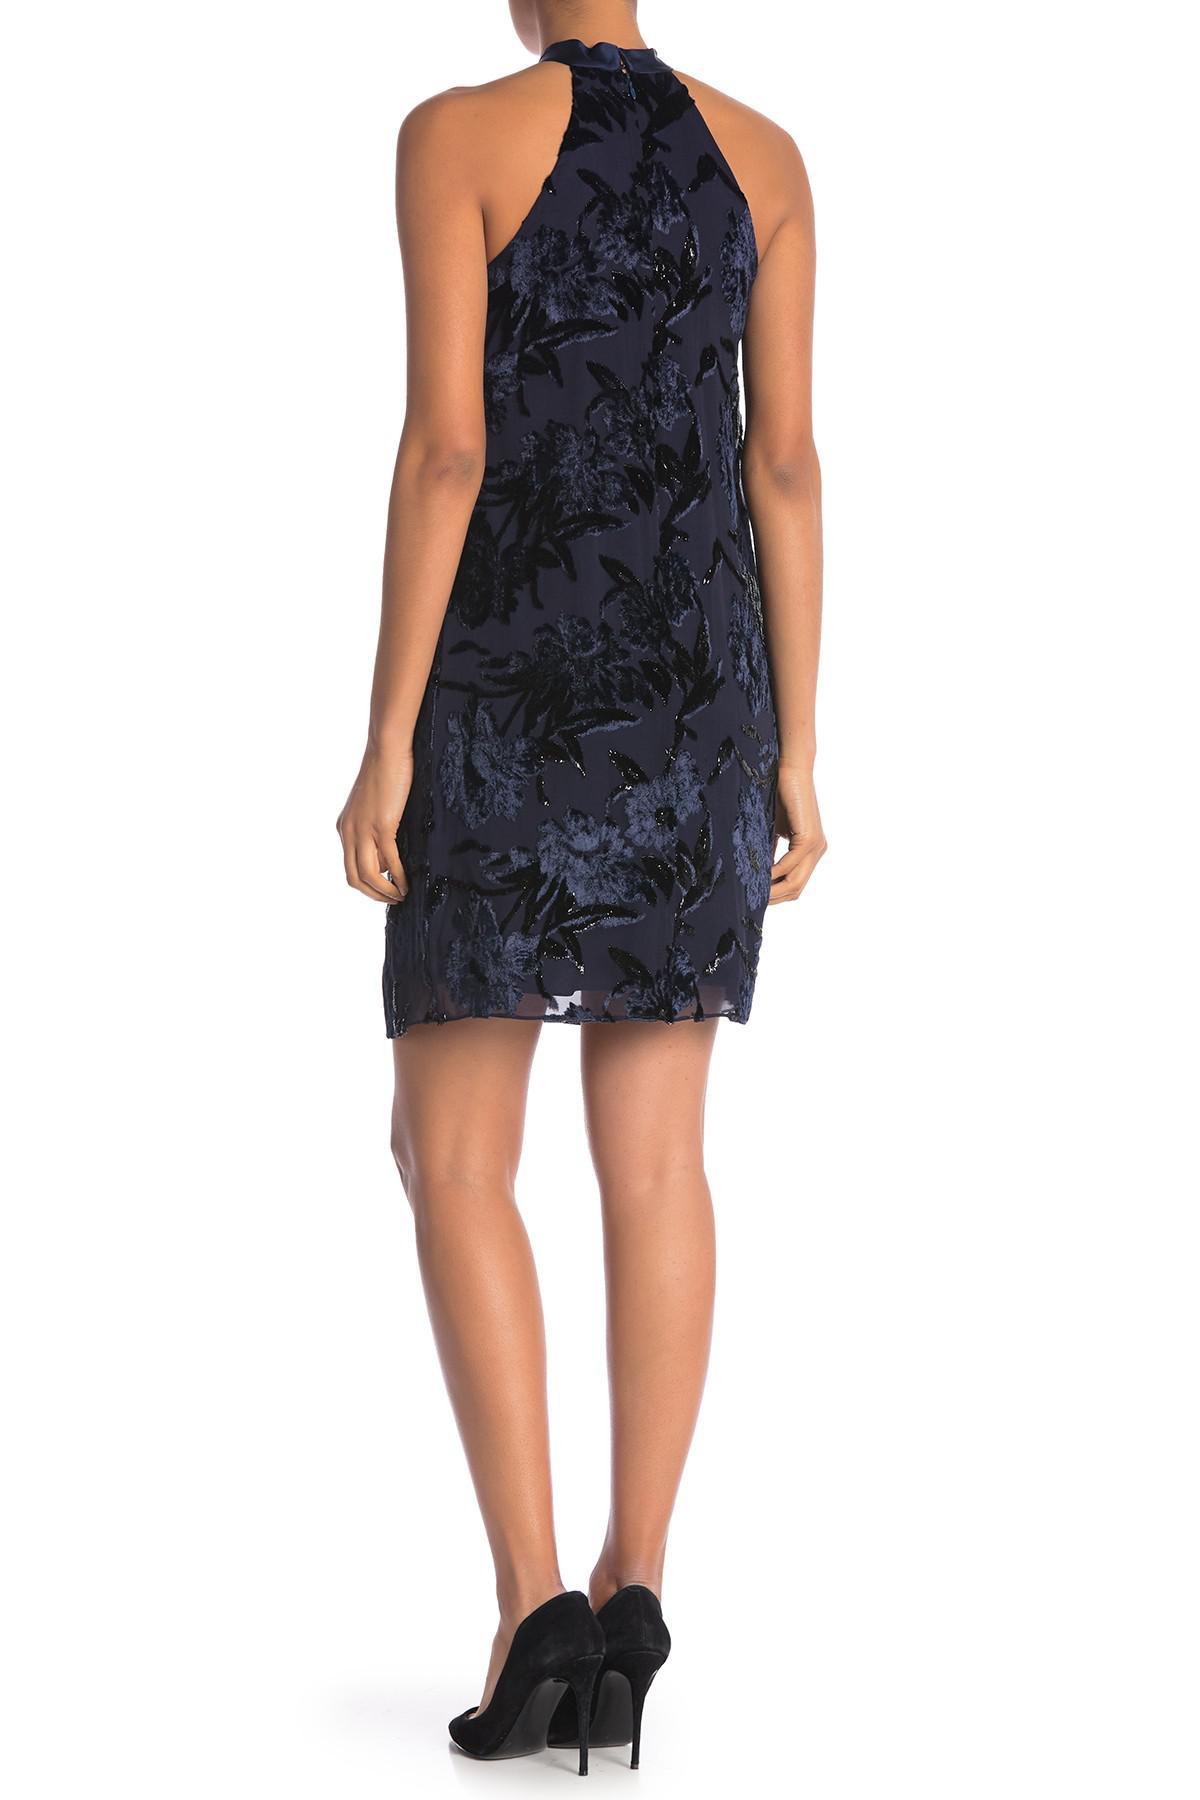 67d0cfa5ea Elie Tahari - Blue Anika Sleeveless Dress - Lyst. View fullscreen